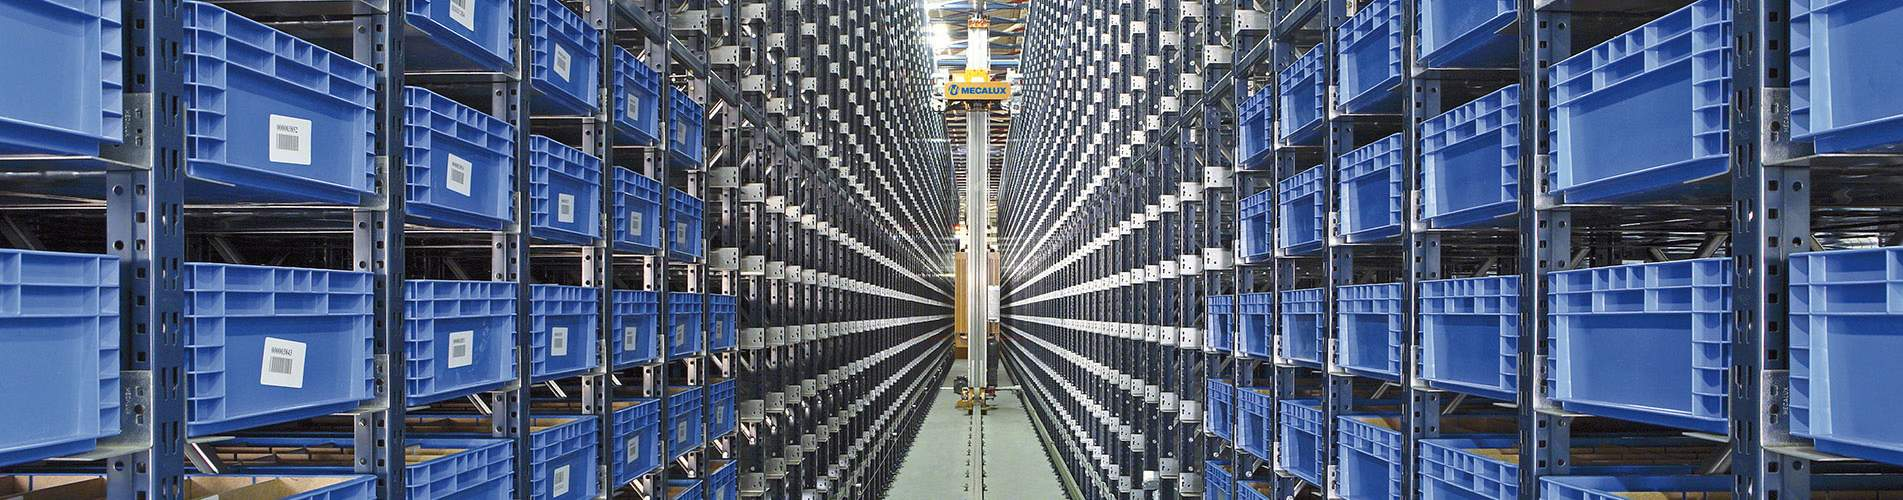 Transelevadores para caixas